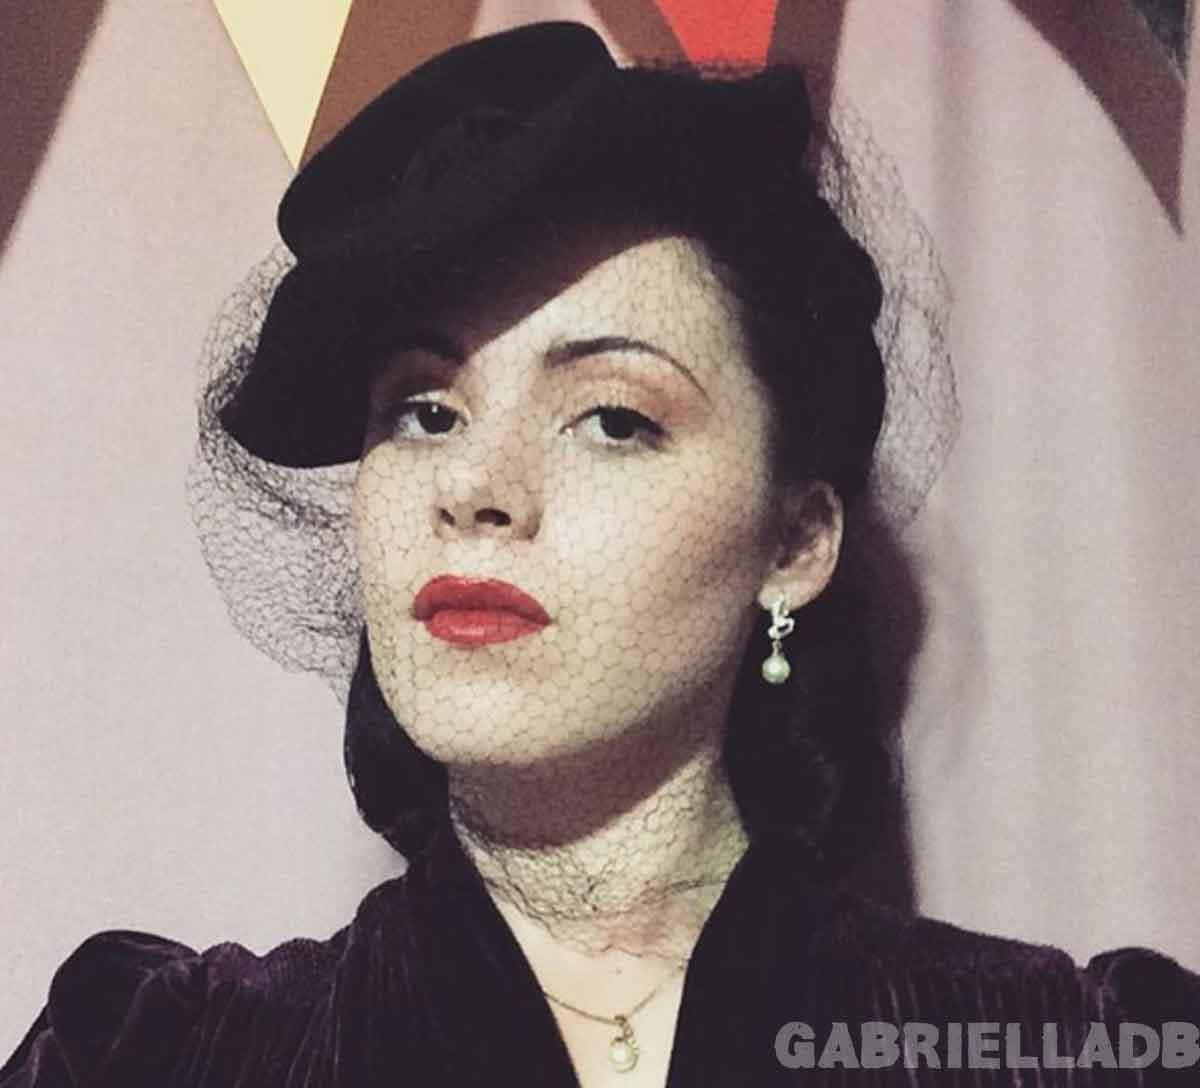 Besame-Cosmetics-Girl-GabriellaD